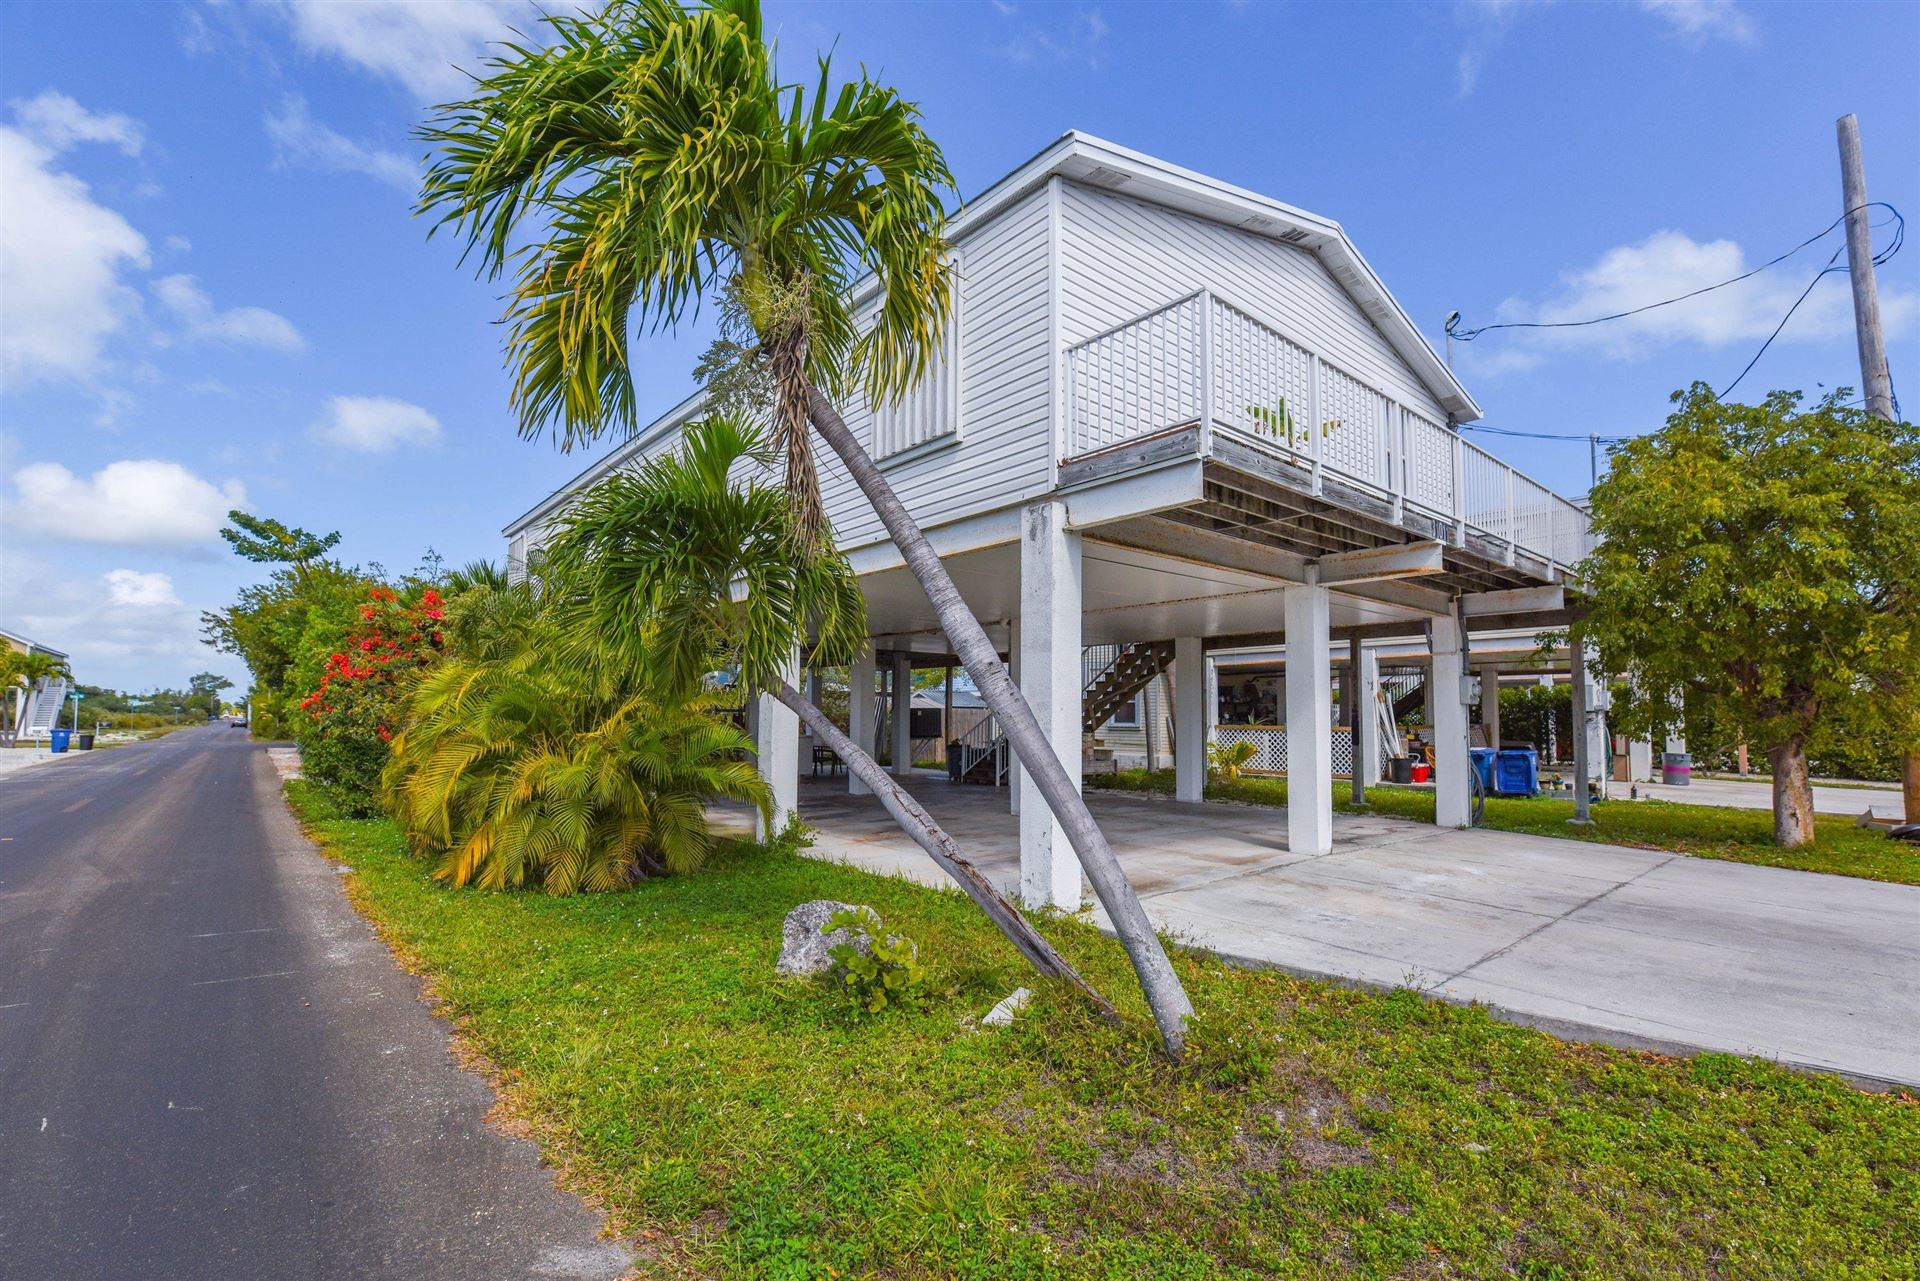 31011 Avenue C, Big Pine, FL 33043 - #: 594659